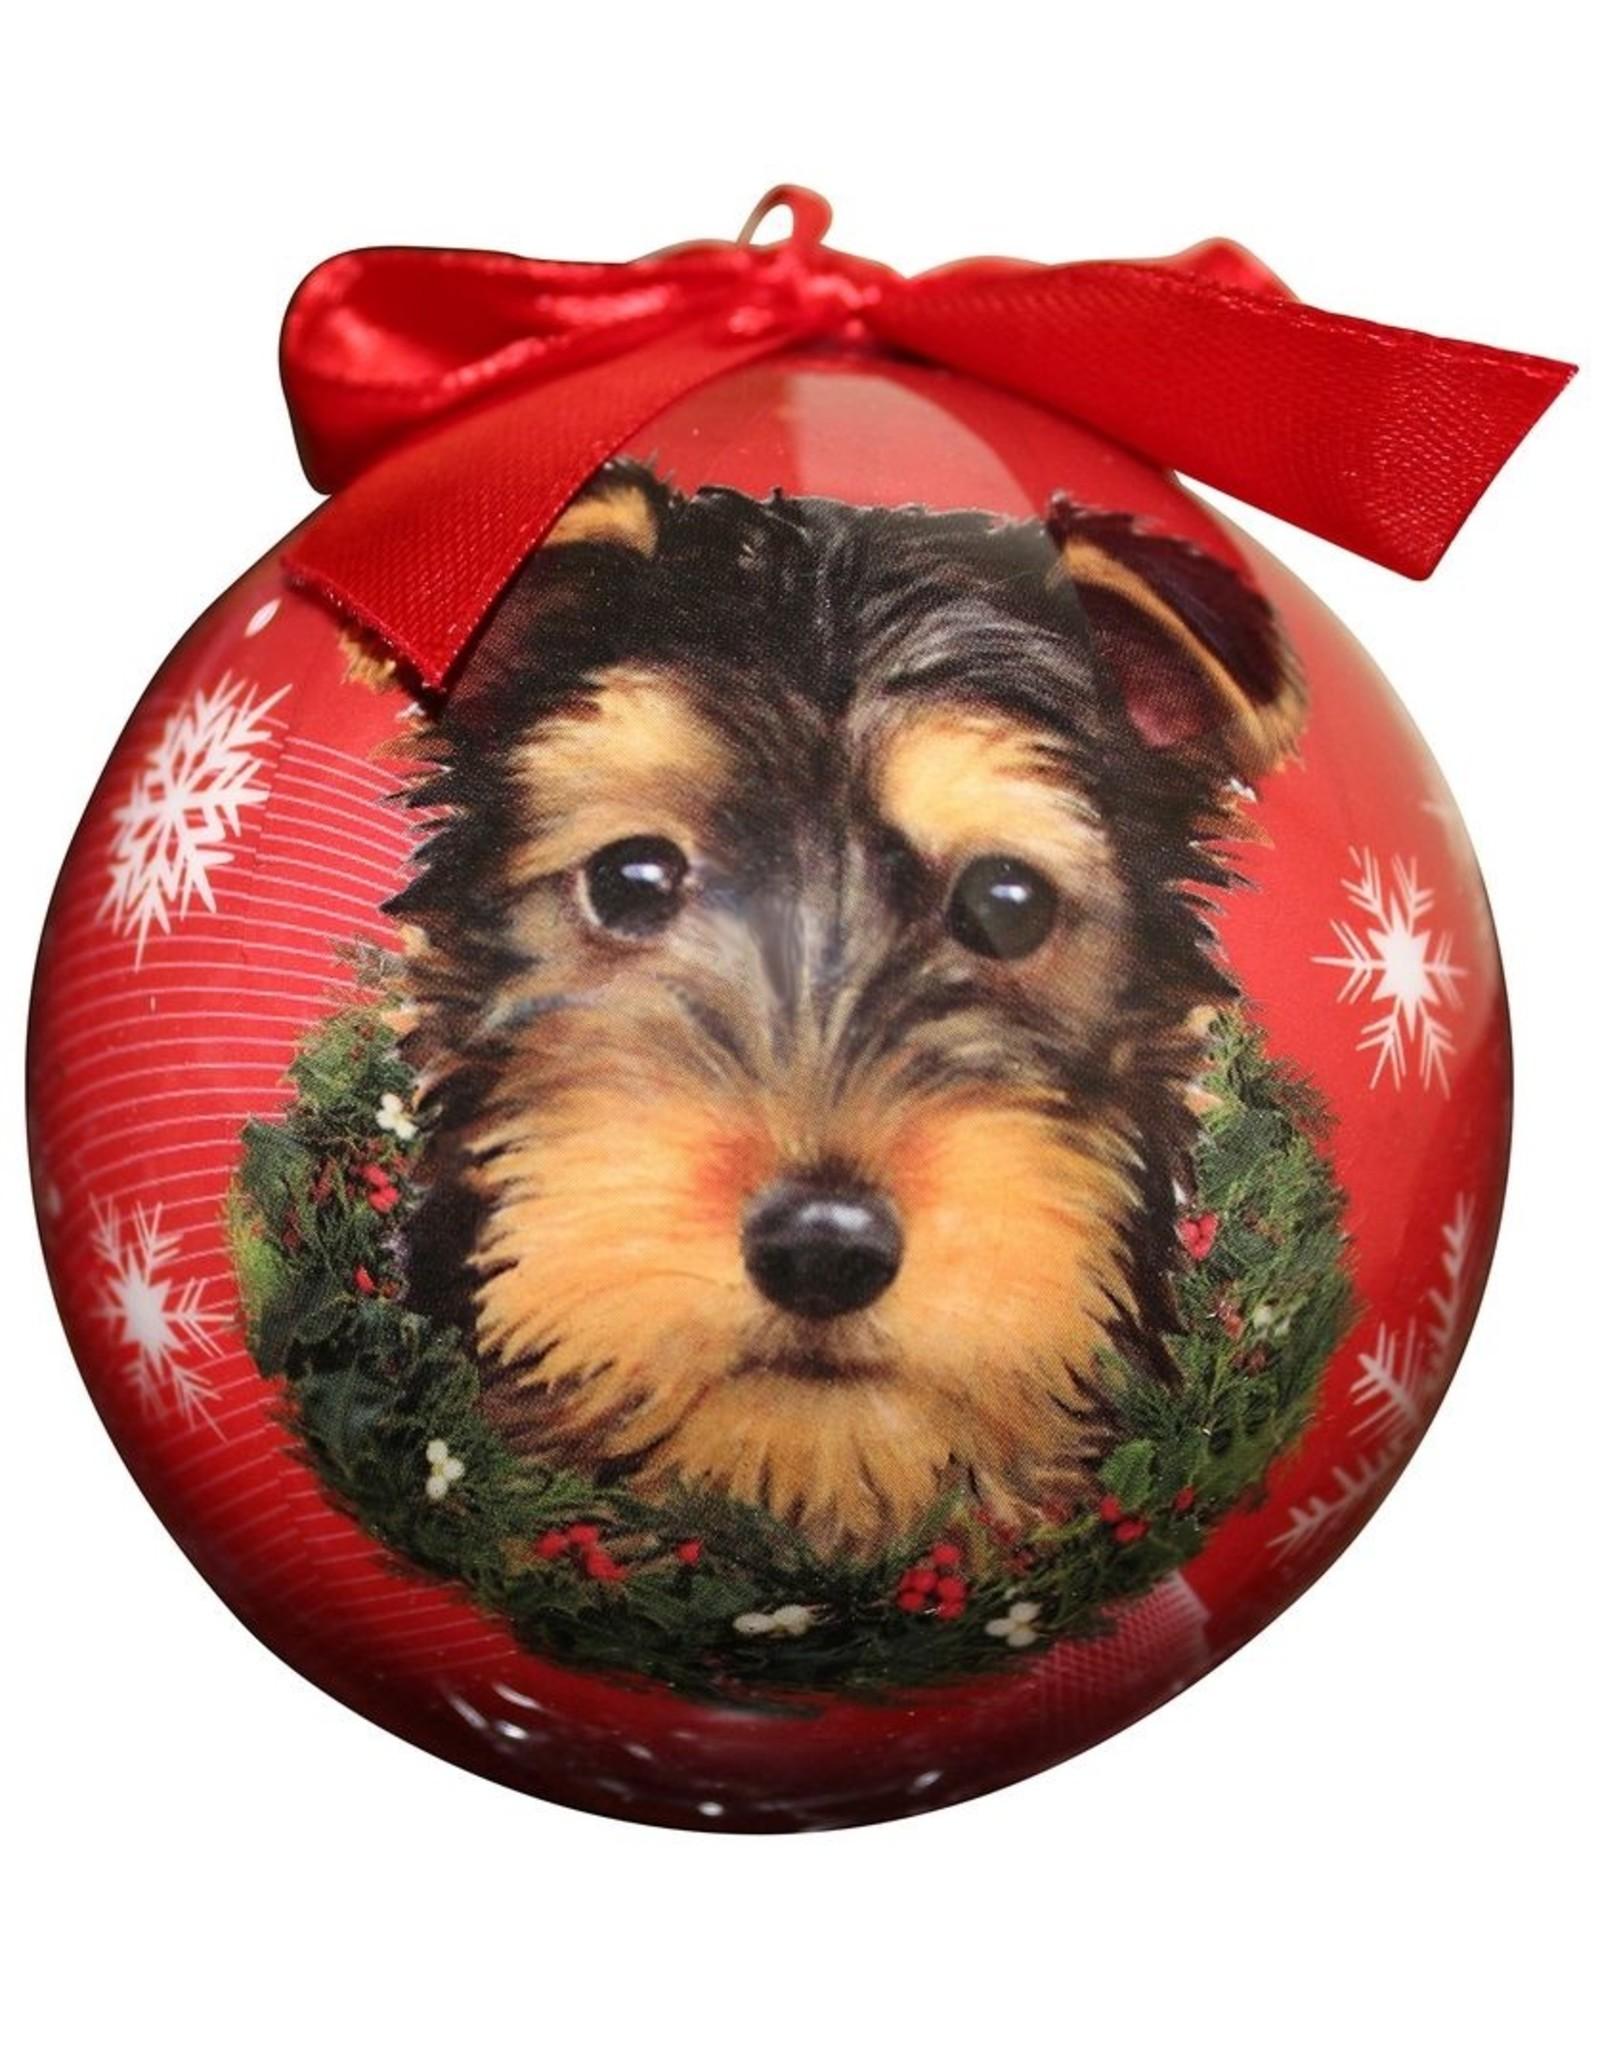 E&S Pets Yorkie Puppy Ball Ornament